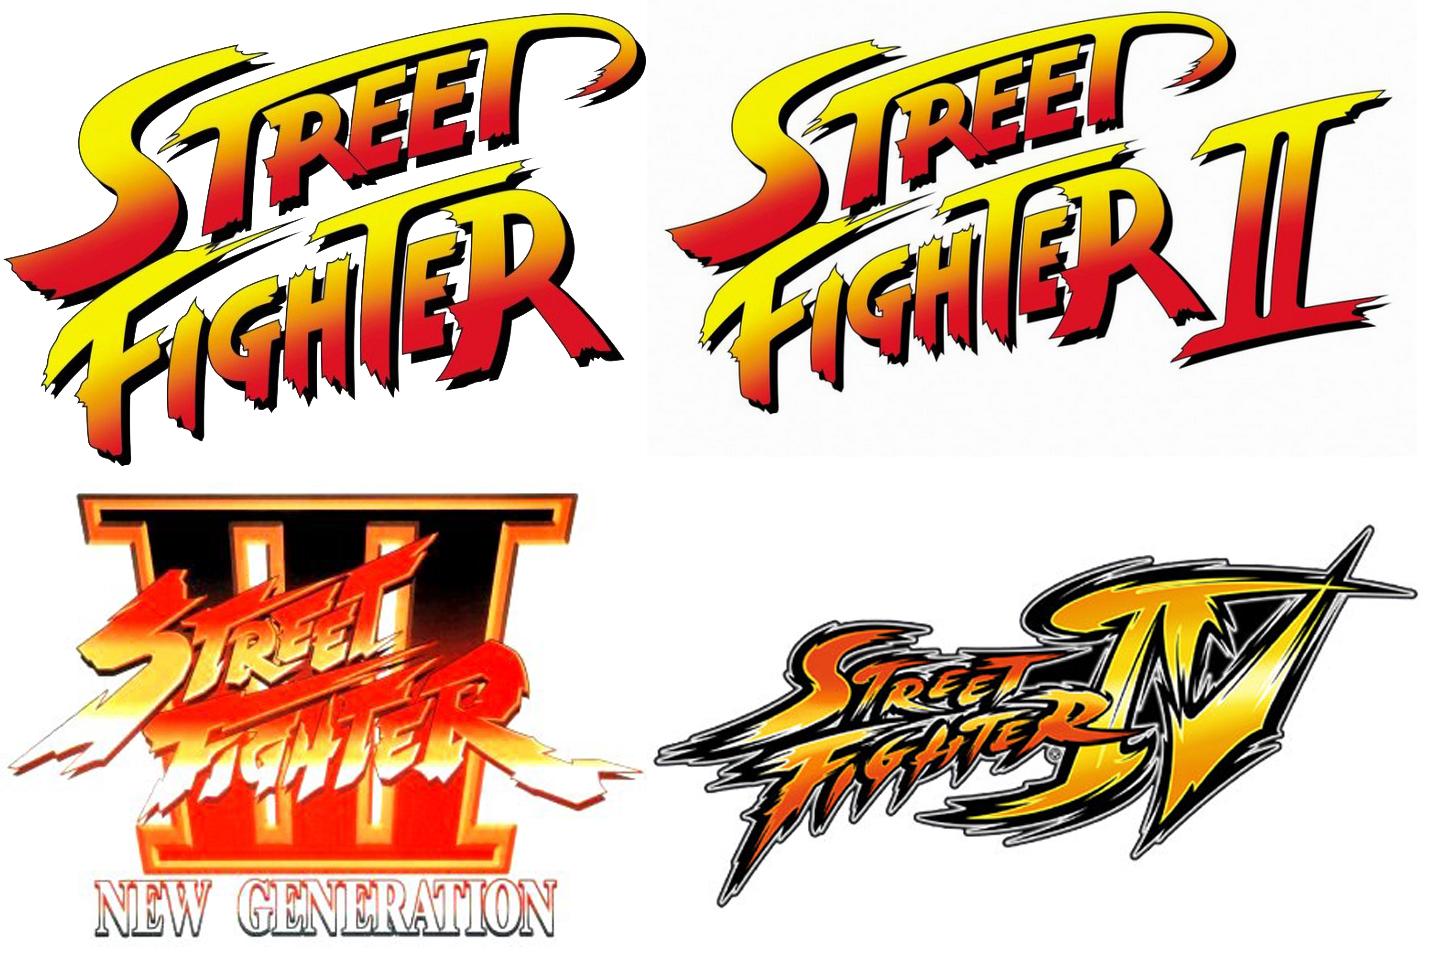 street fighter 2 logo font